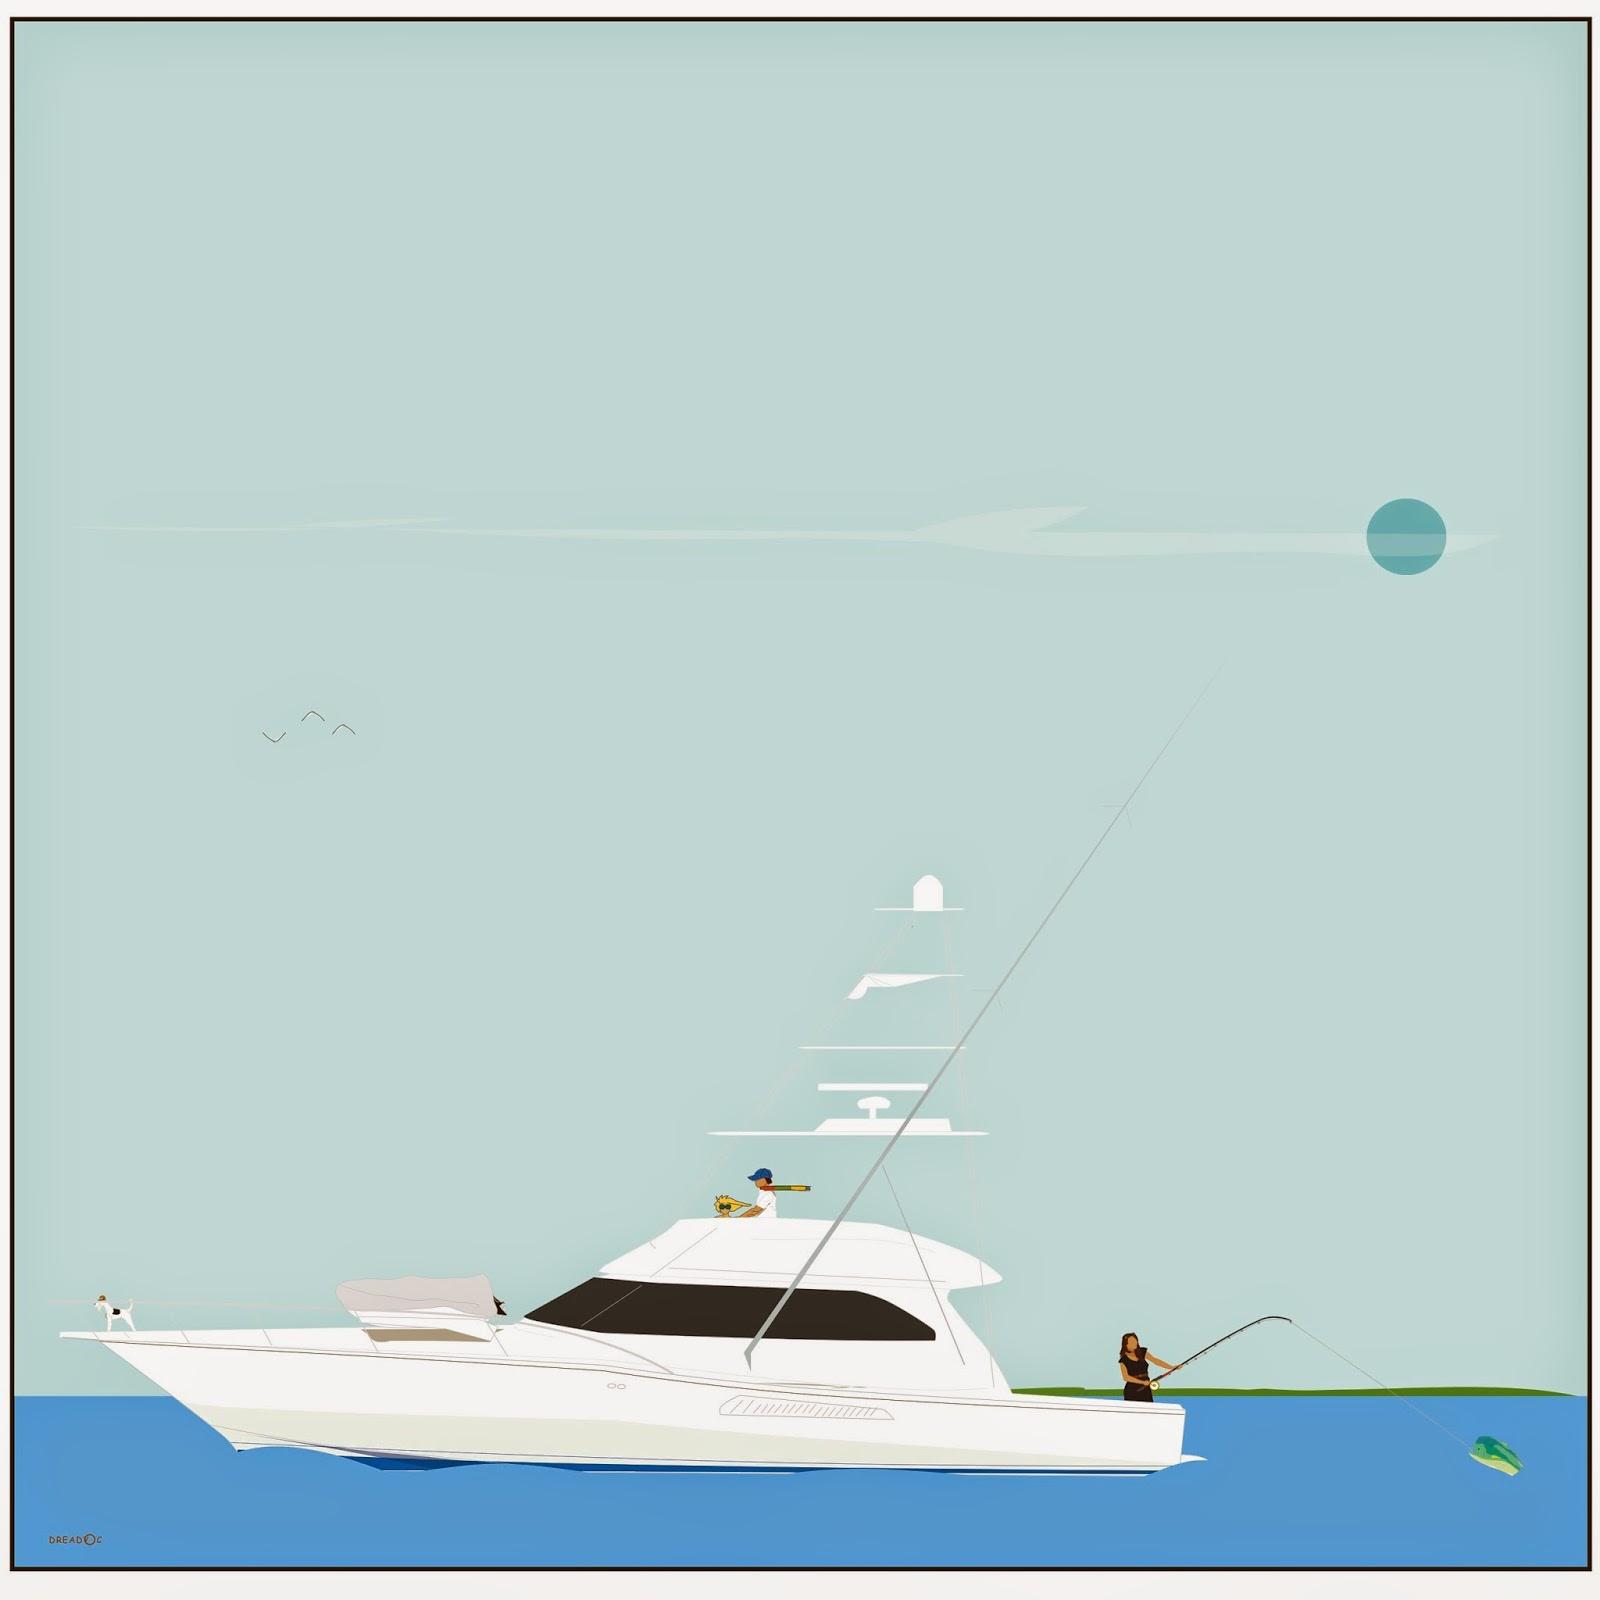 Dready, Dready Art and Everything Dready laura%2Bfishing